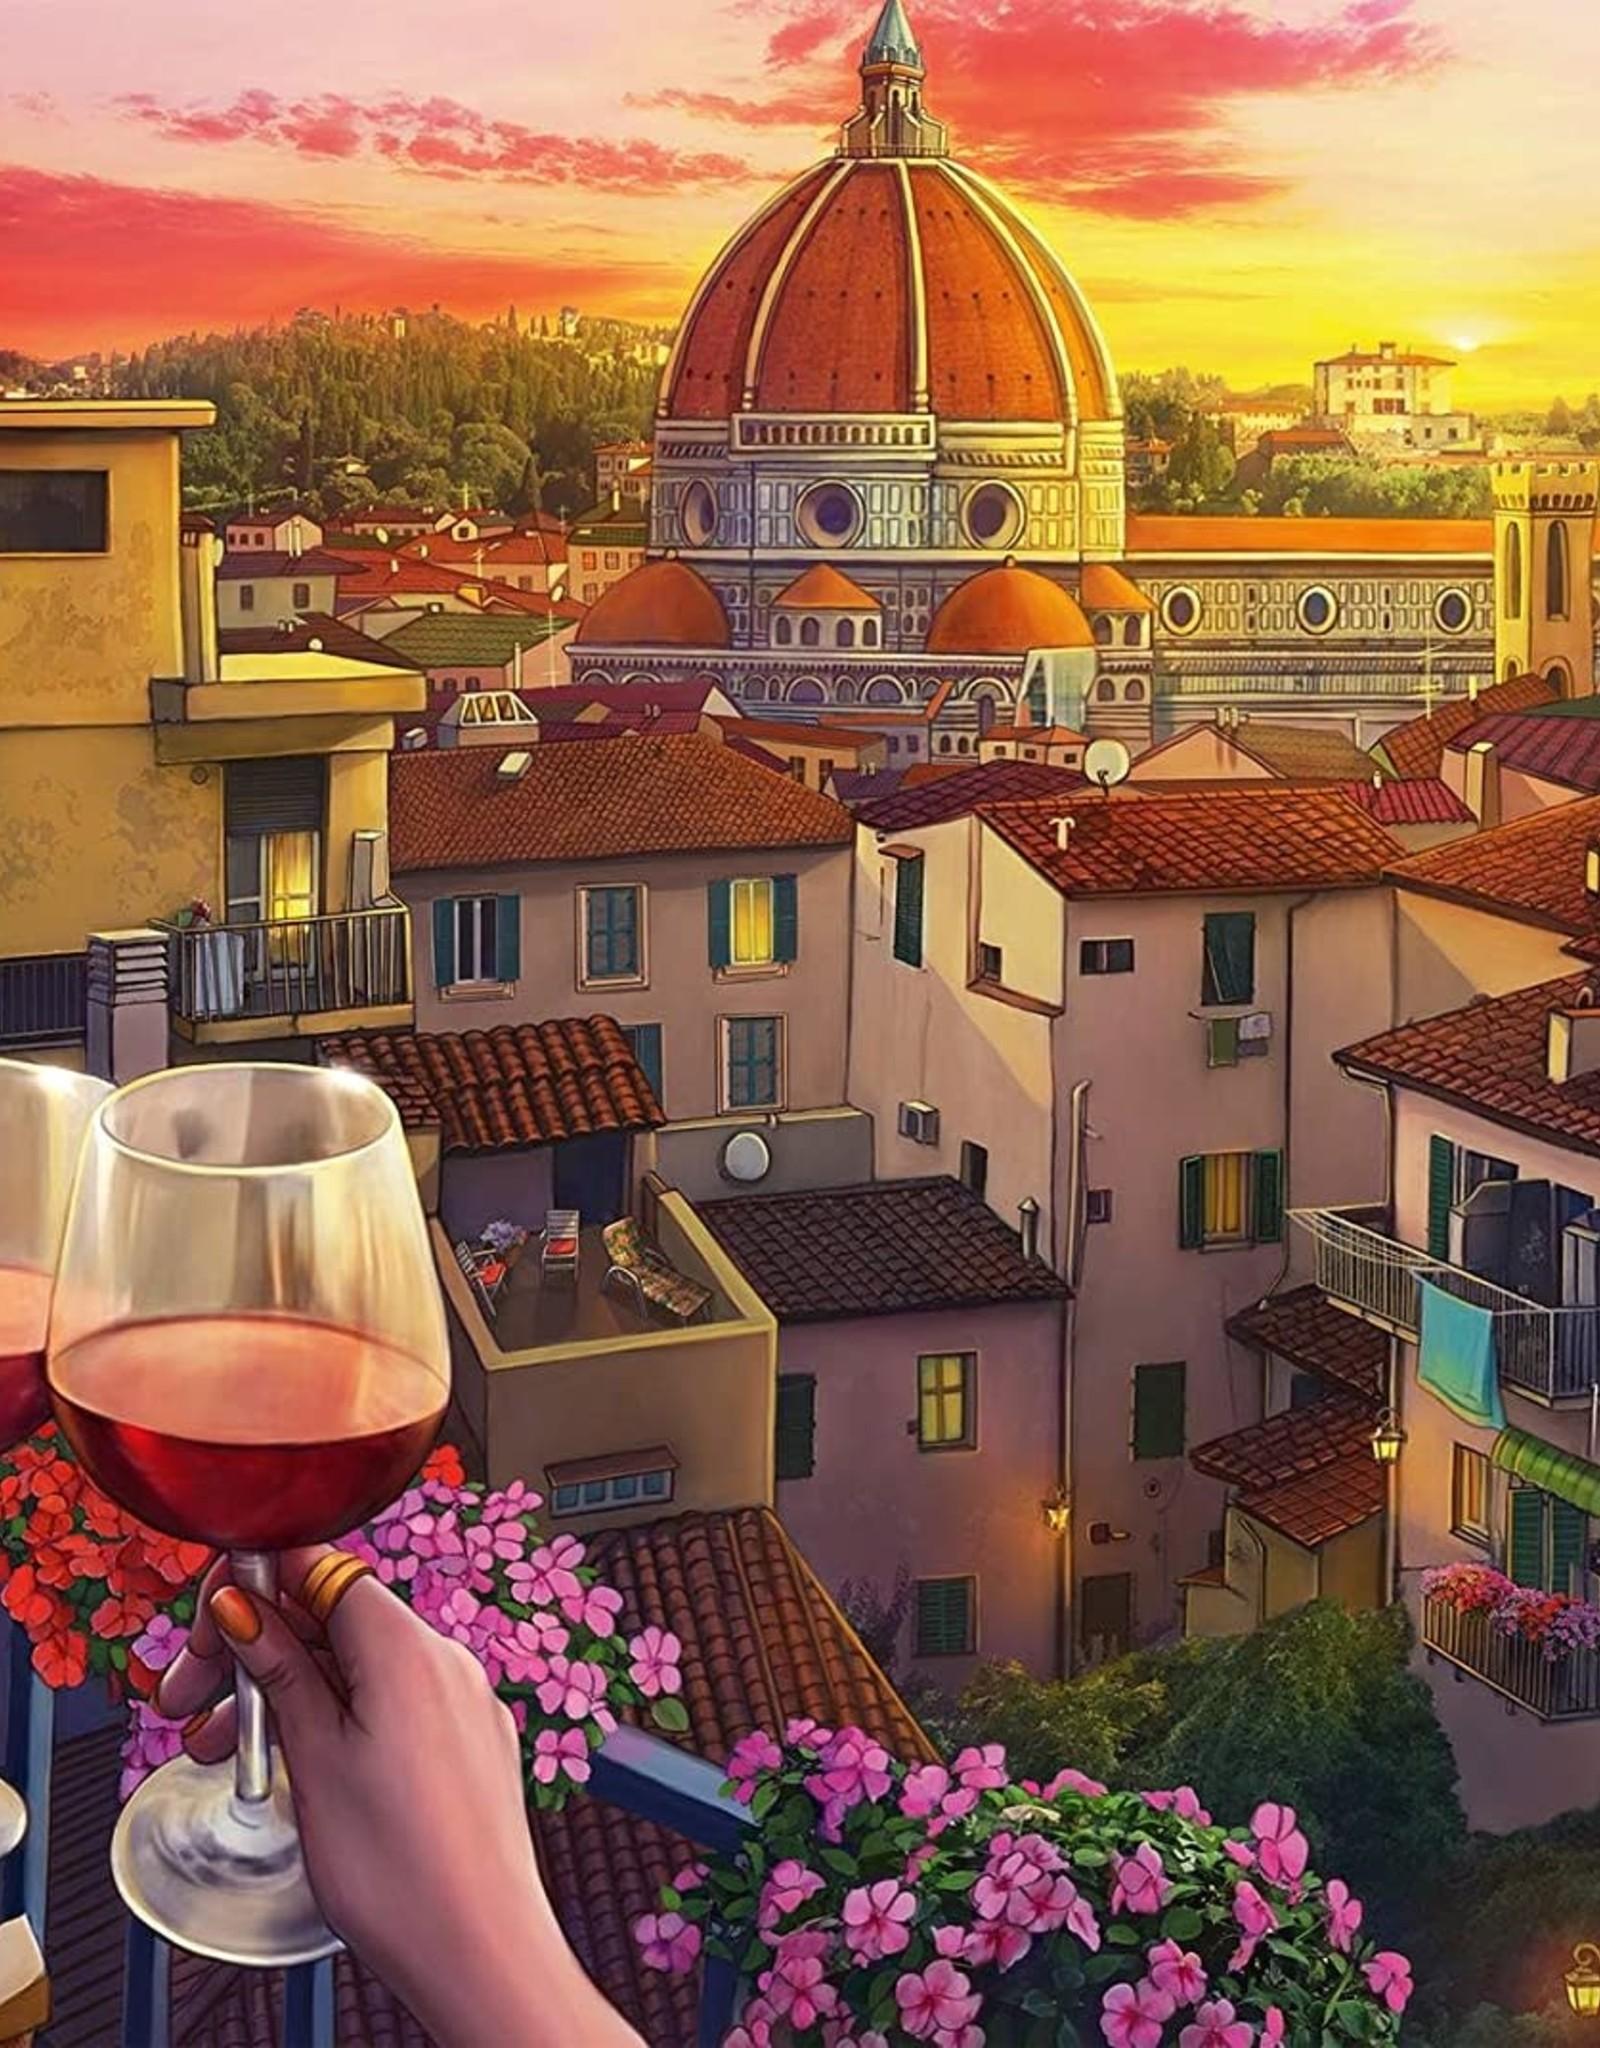 Ravensburger 500pc Cozy Wine Terrace LG